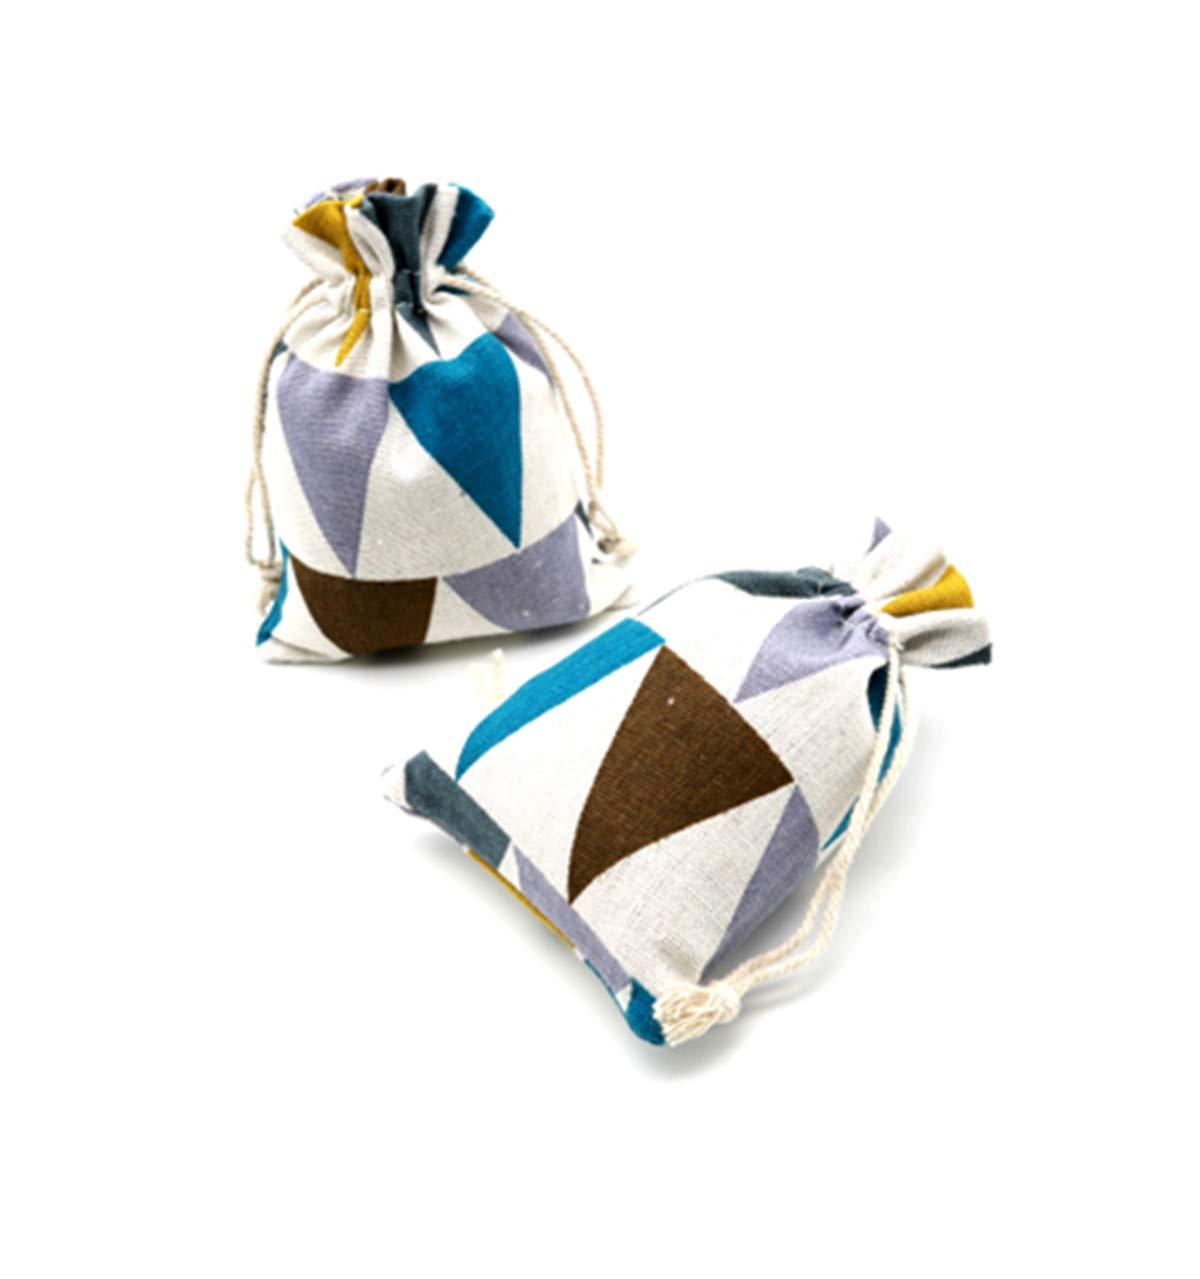 Zzooi Geometric Figure Triangle Burlaps Bags Sack Bag Small Burlap Drawstring Bags 20PCS